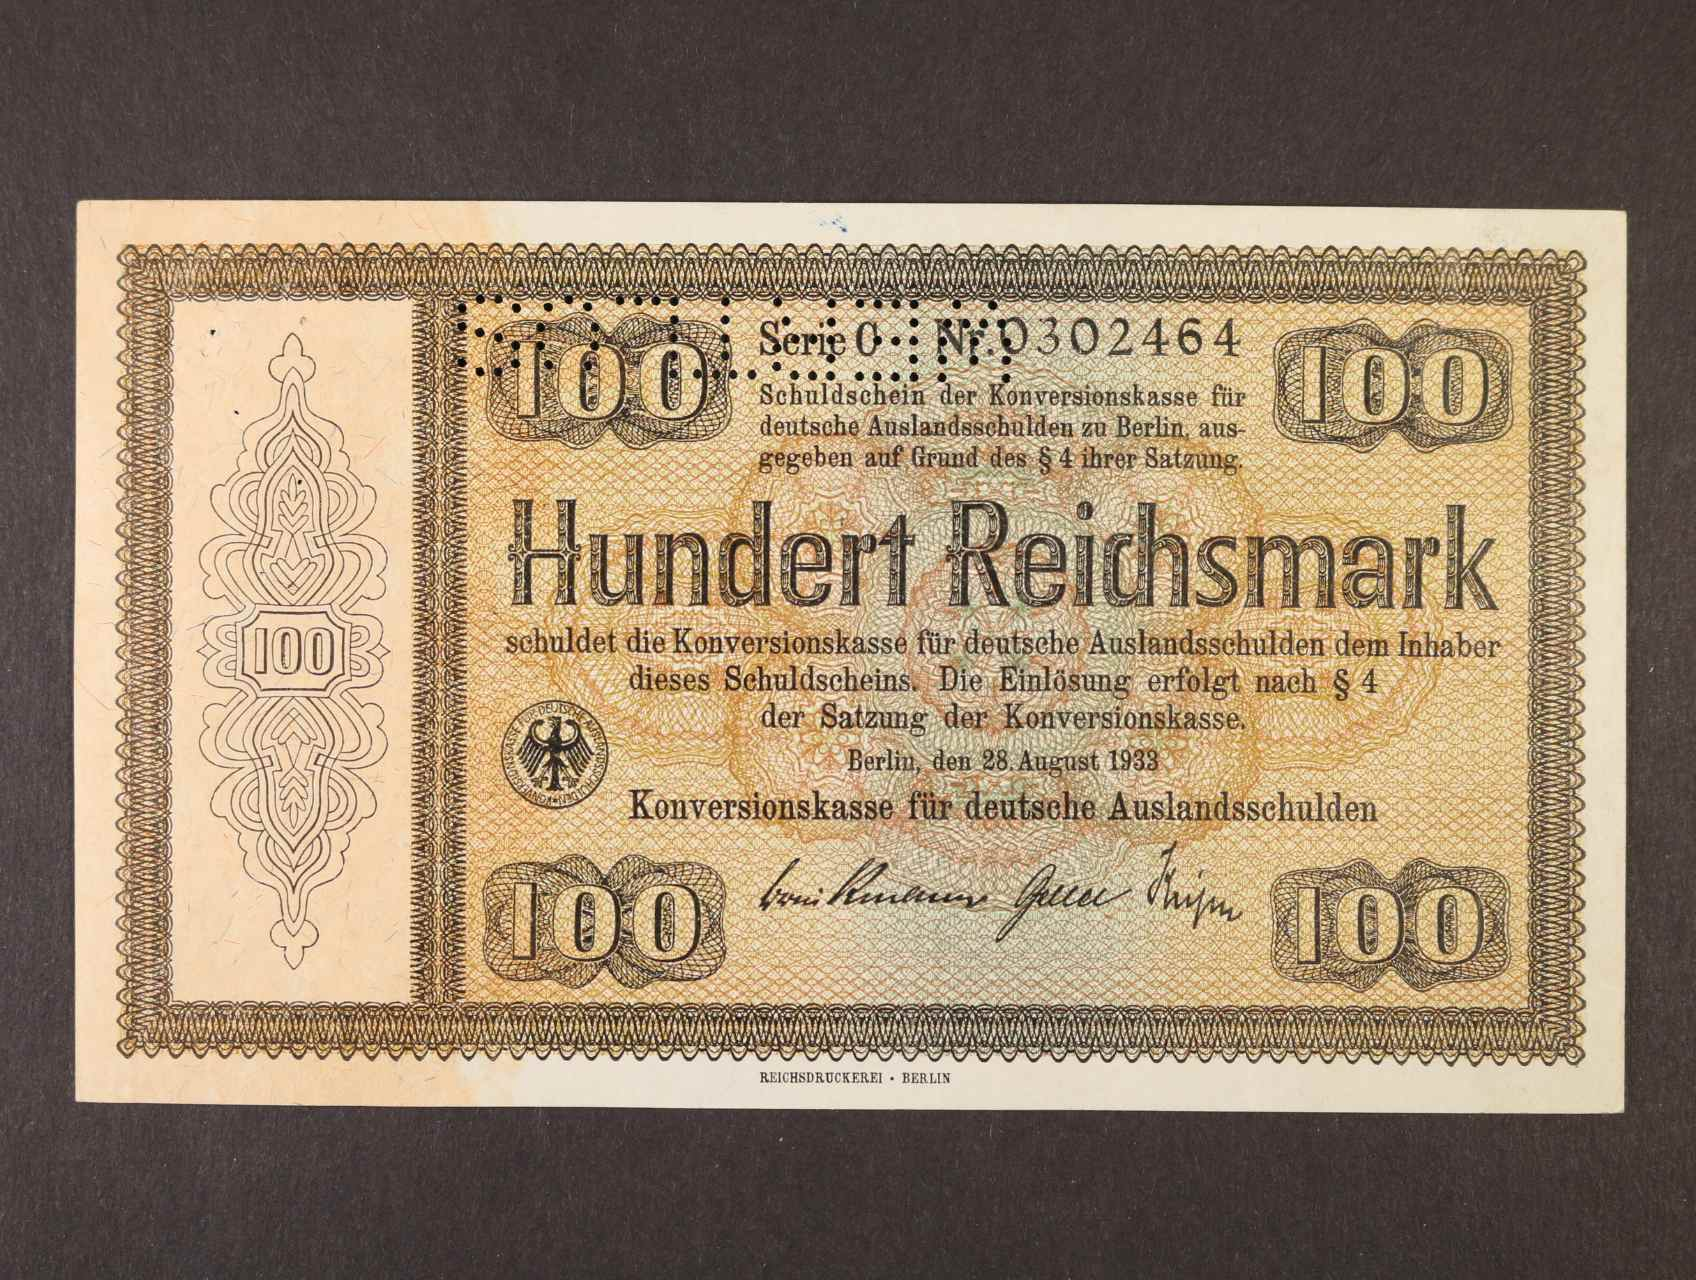 100 RM 28.8.1933 série C Konversionskassenschein, obrácená perforace WERTLOS, Ro. 705E2